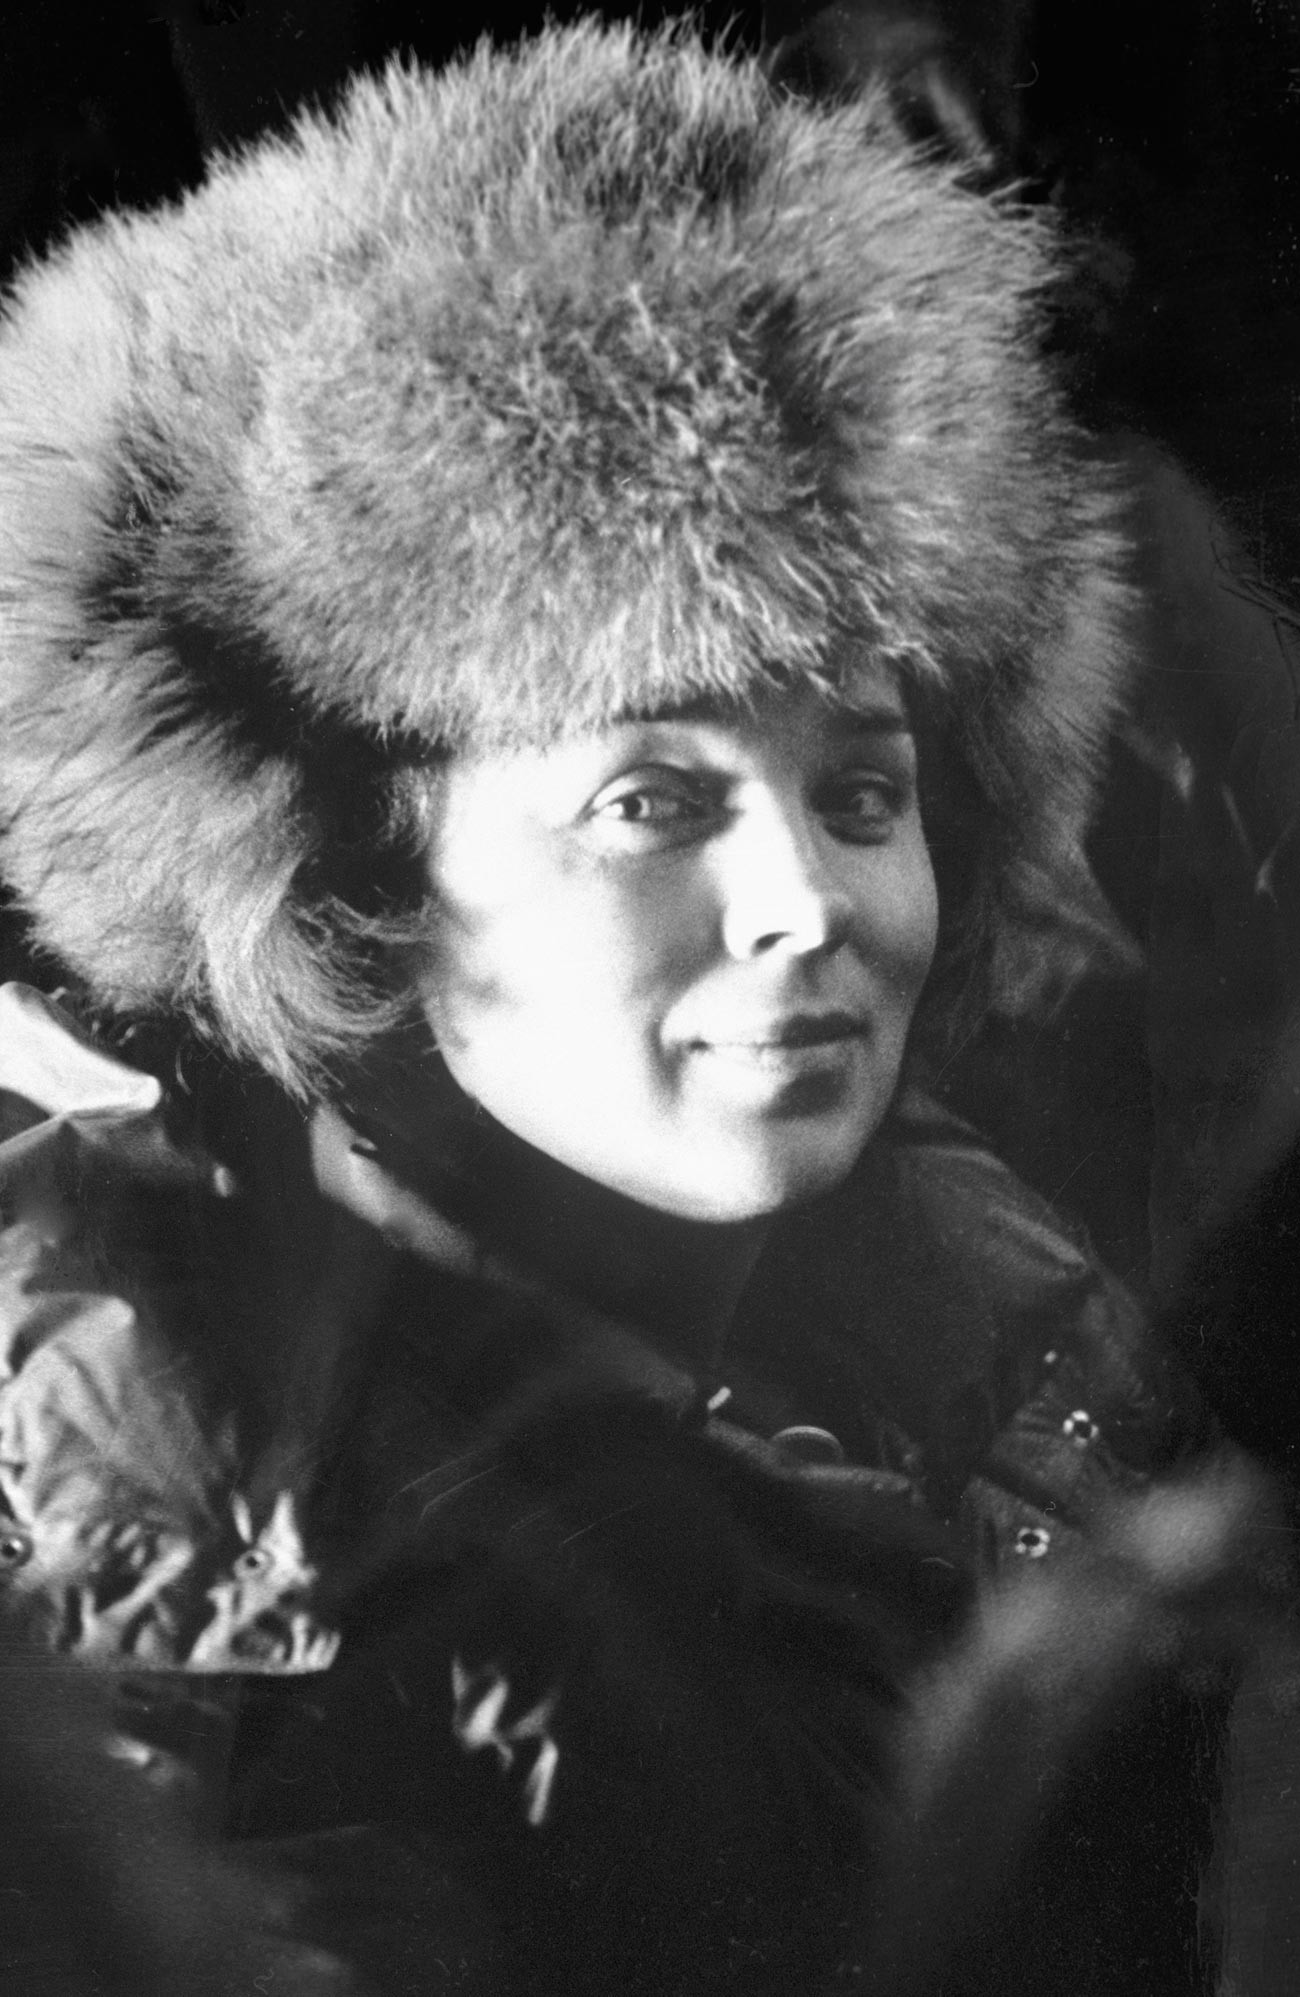 Valentina Kouznetsova, capitaine de l'équipe soviétique féminine Metelitsa